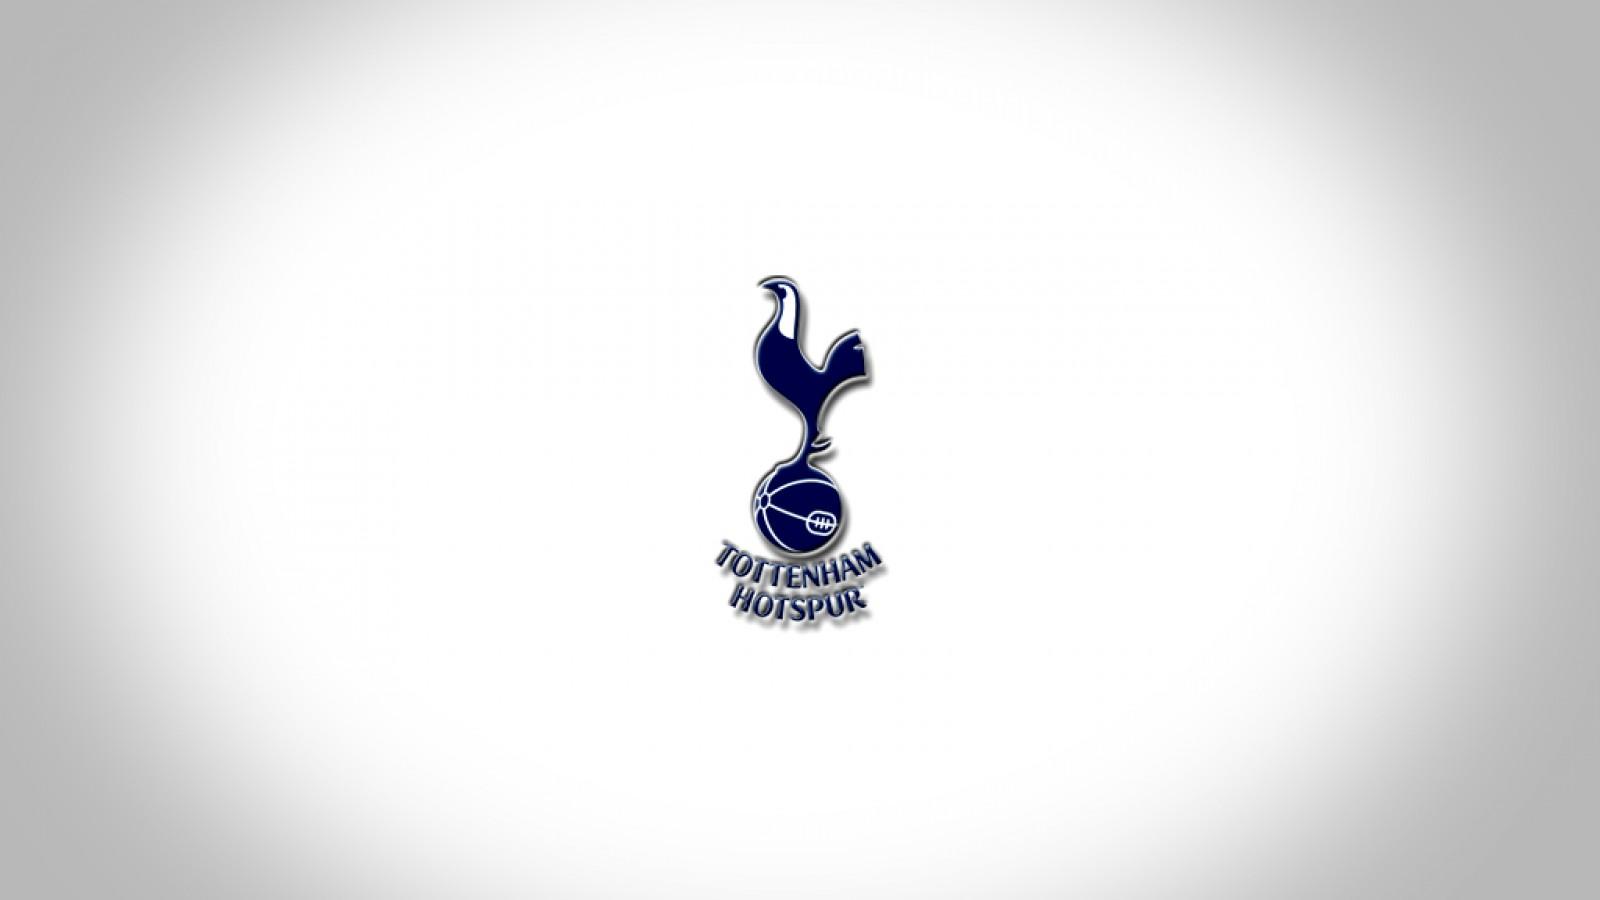 Tottenham Hotspurs Wallpaper 2015